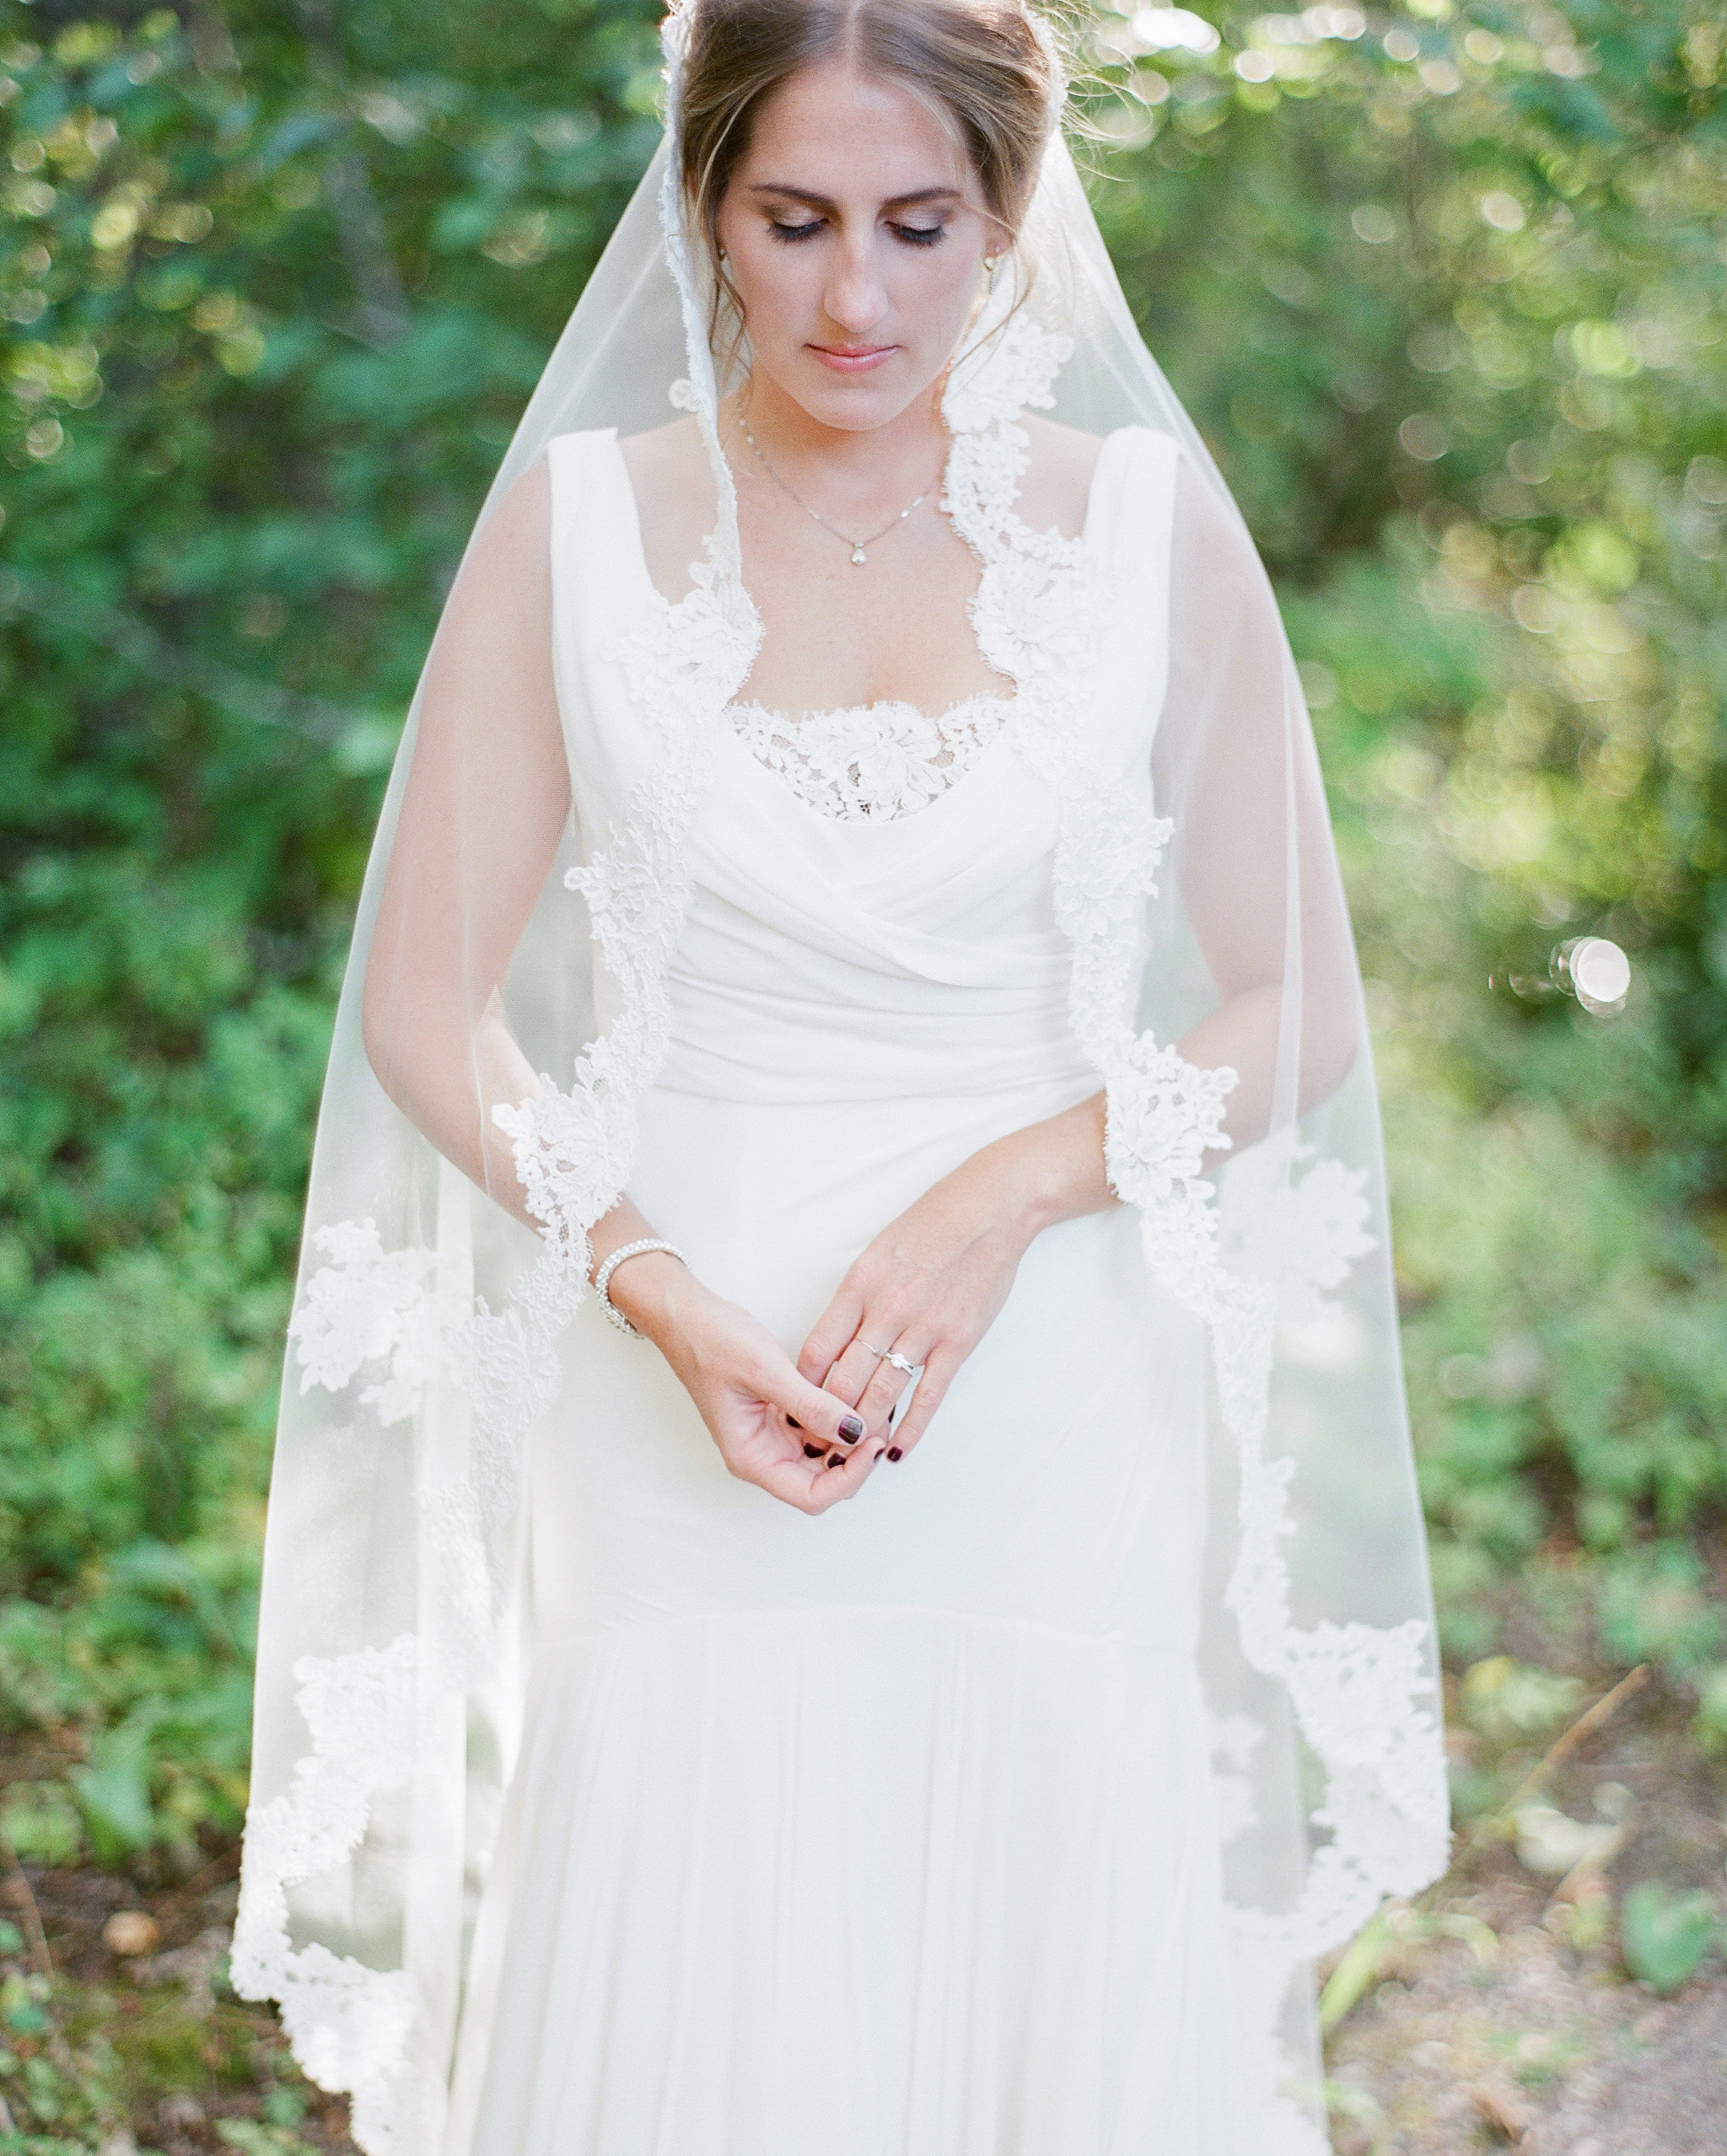 robin-kenny-wedding-veil-082-s112068-0715.jpg